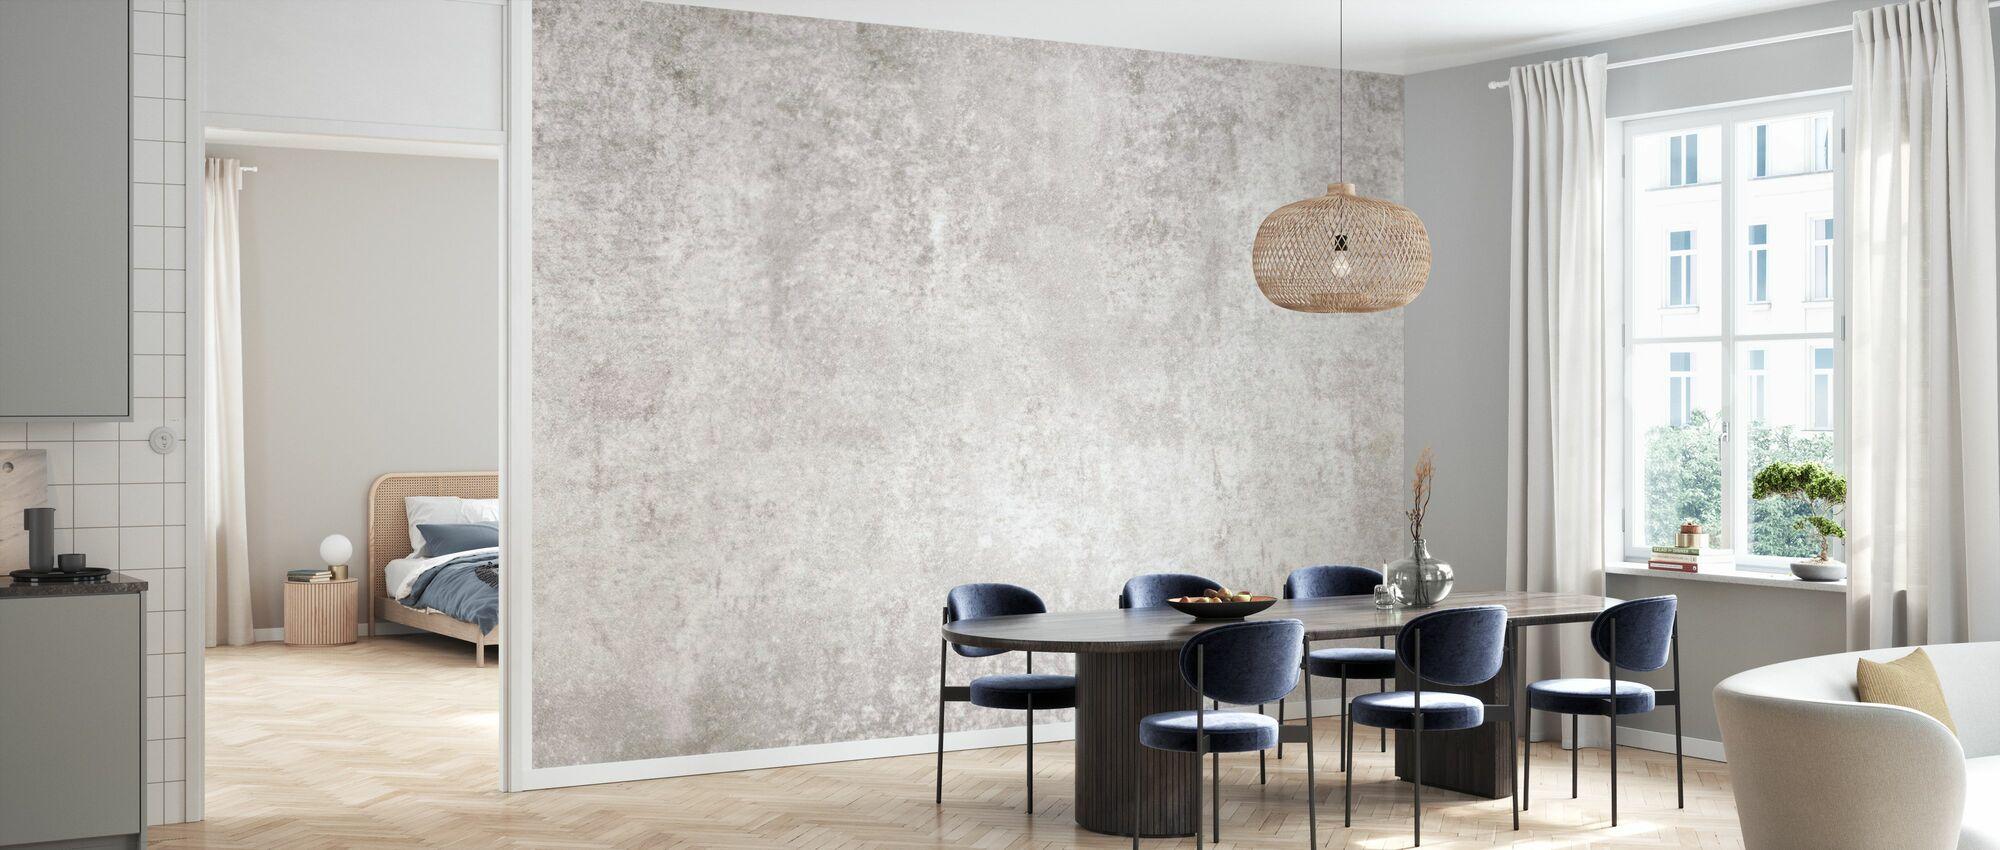 Patina - Wallpaper - Kitchen